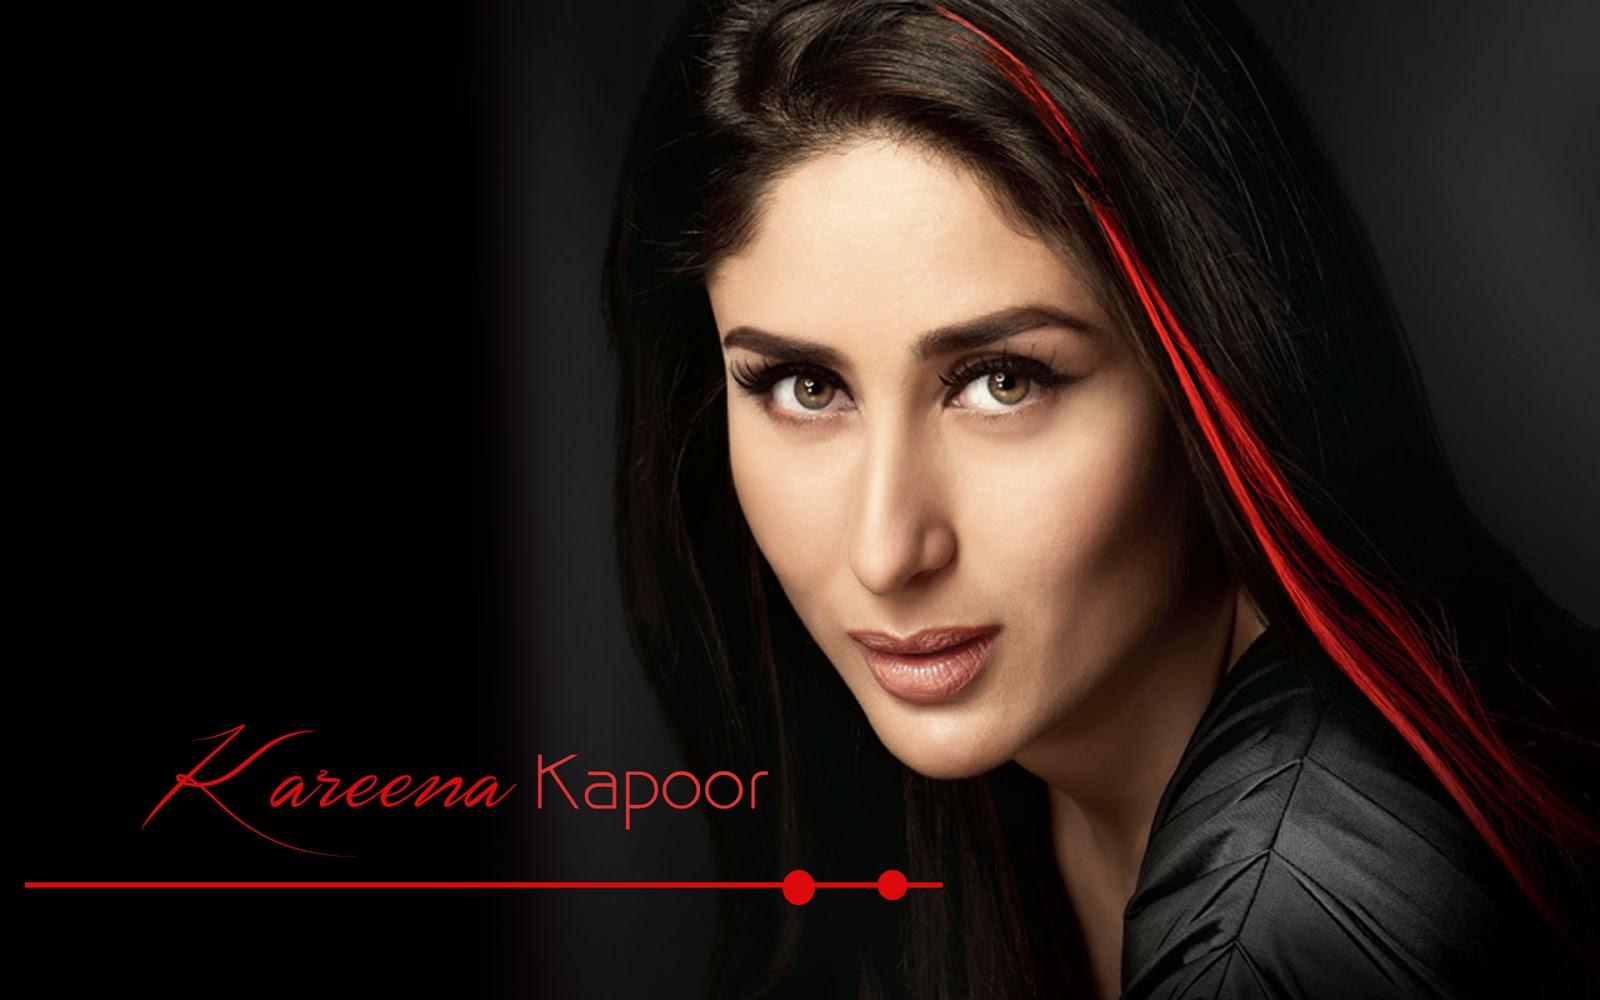 All Hd Wallpapers Kareena Kapoor Beautiful Wallpaper  Hd -2553